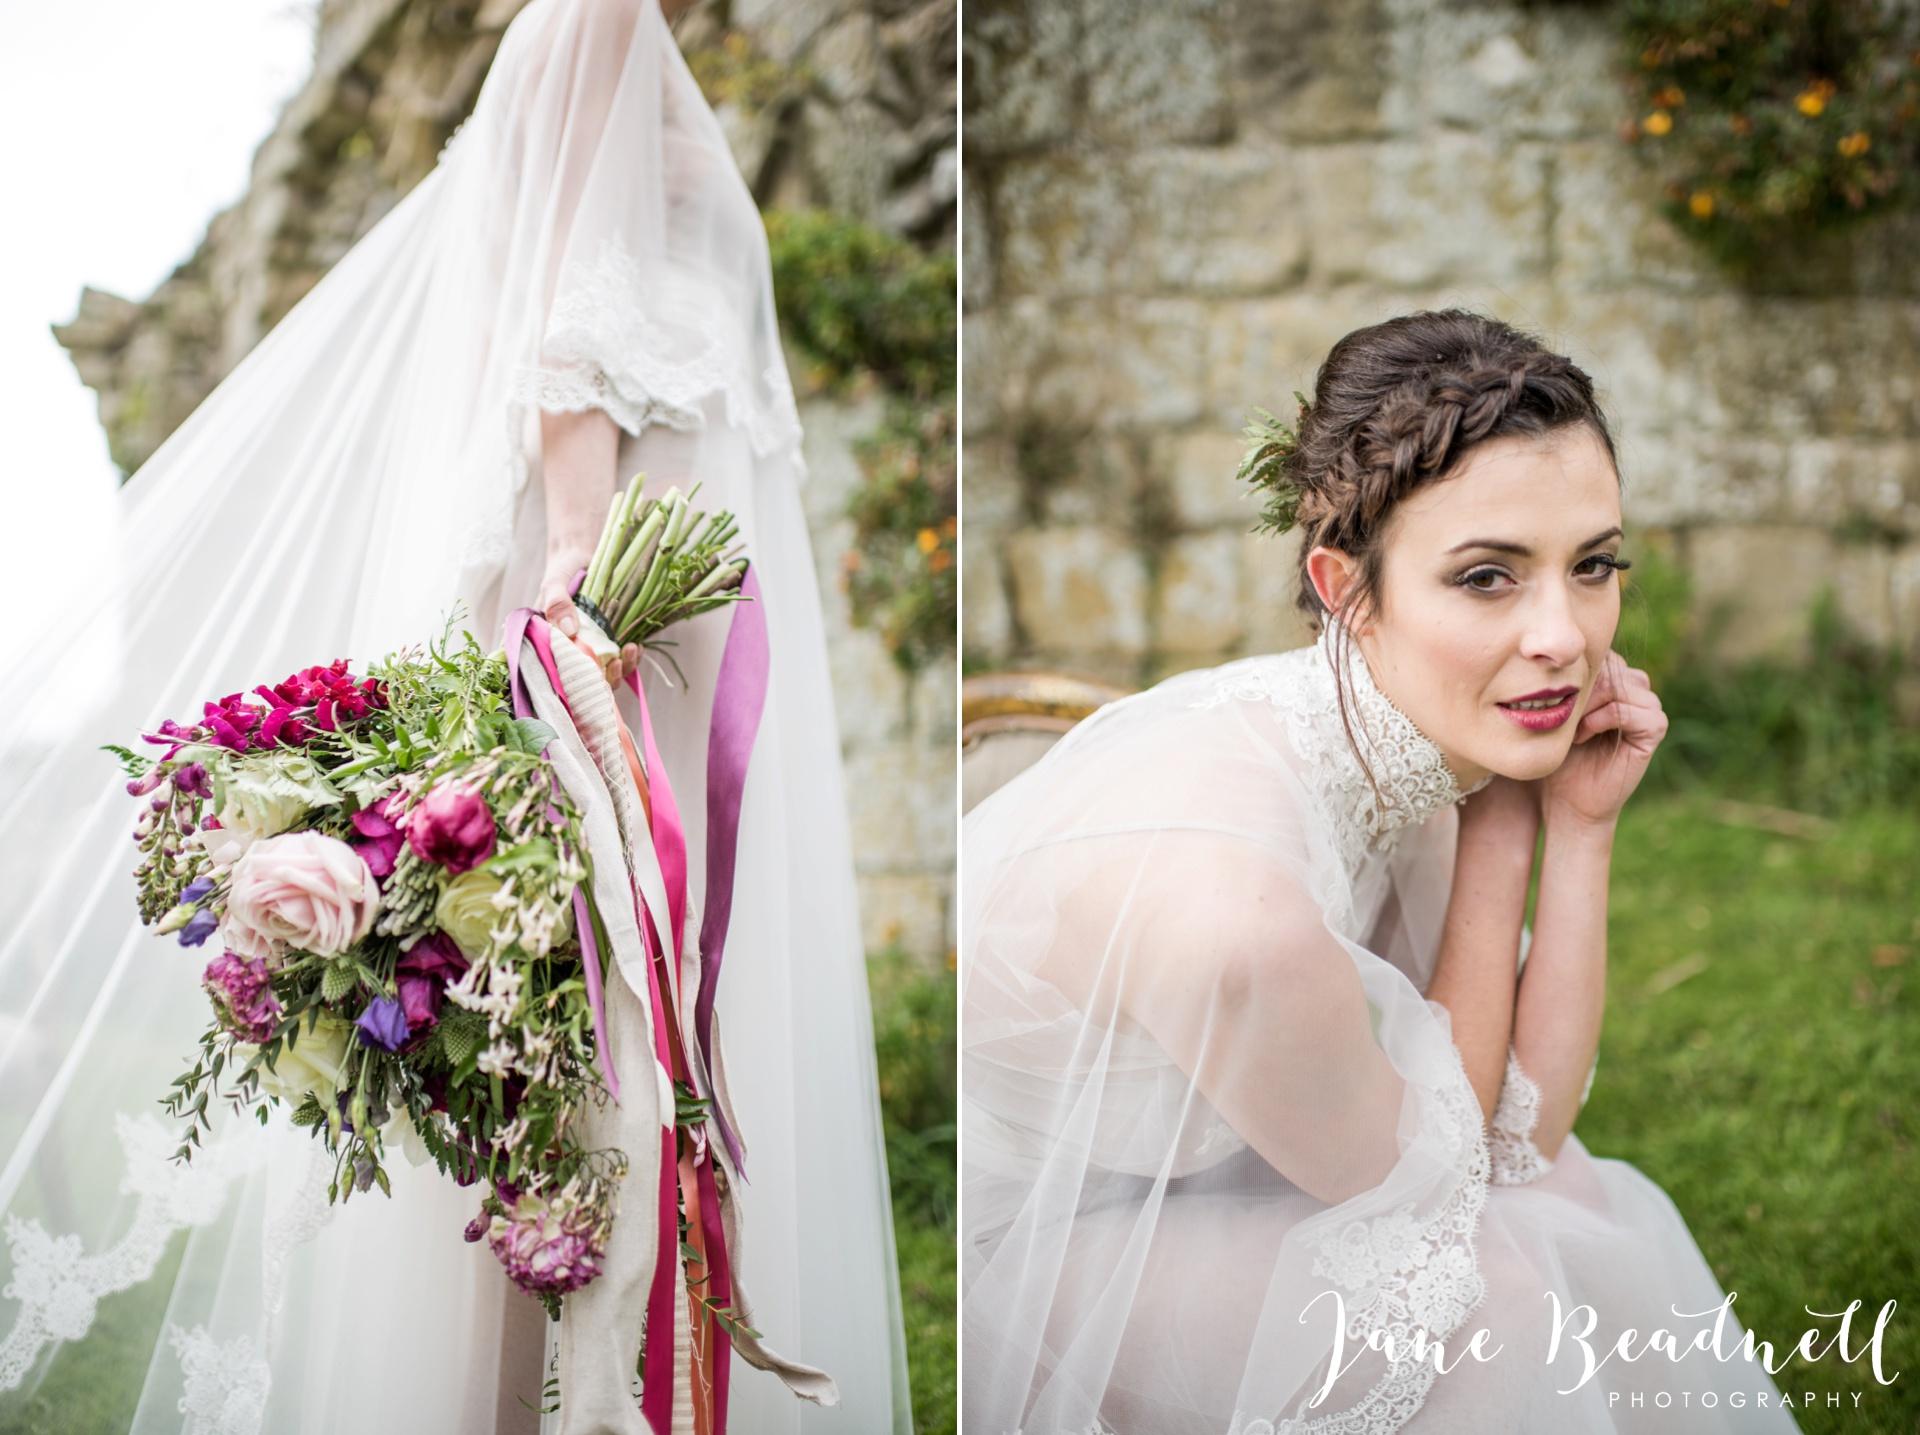 Jervaulx Abbey wedding photography fine art Yorkshire wedding photographer jane beadnell_0044